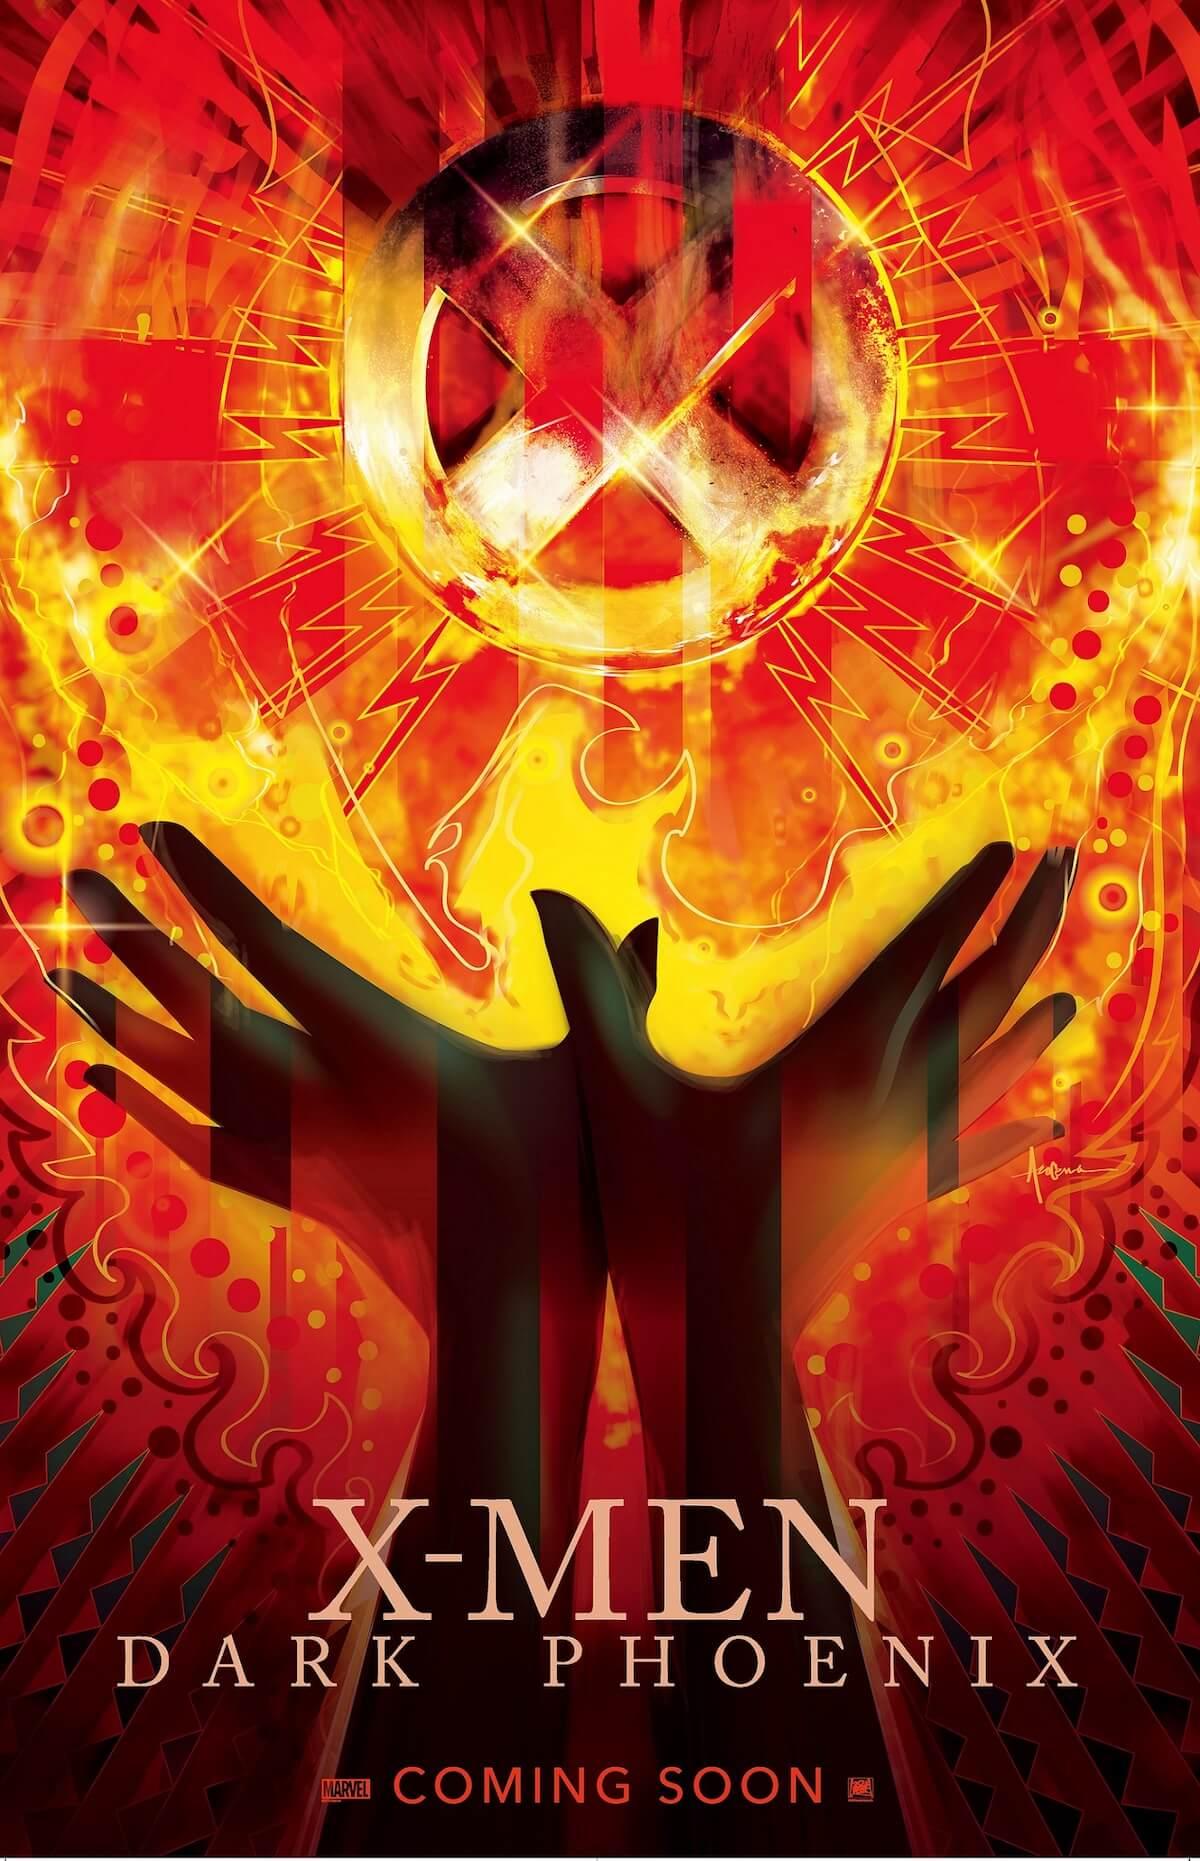 『X-MEN:ダーク・フェニックス』公開記念イベント<XーMEN DAY>が開催!ジーン役ソフィー・ターナーの特別映像解禁 film190517_xmenday_12